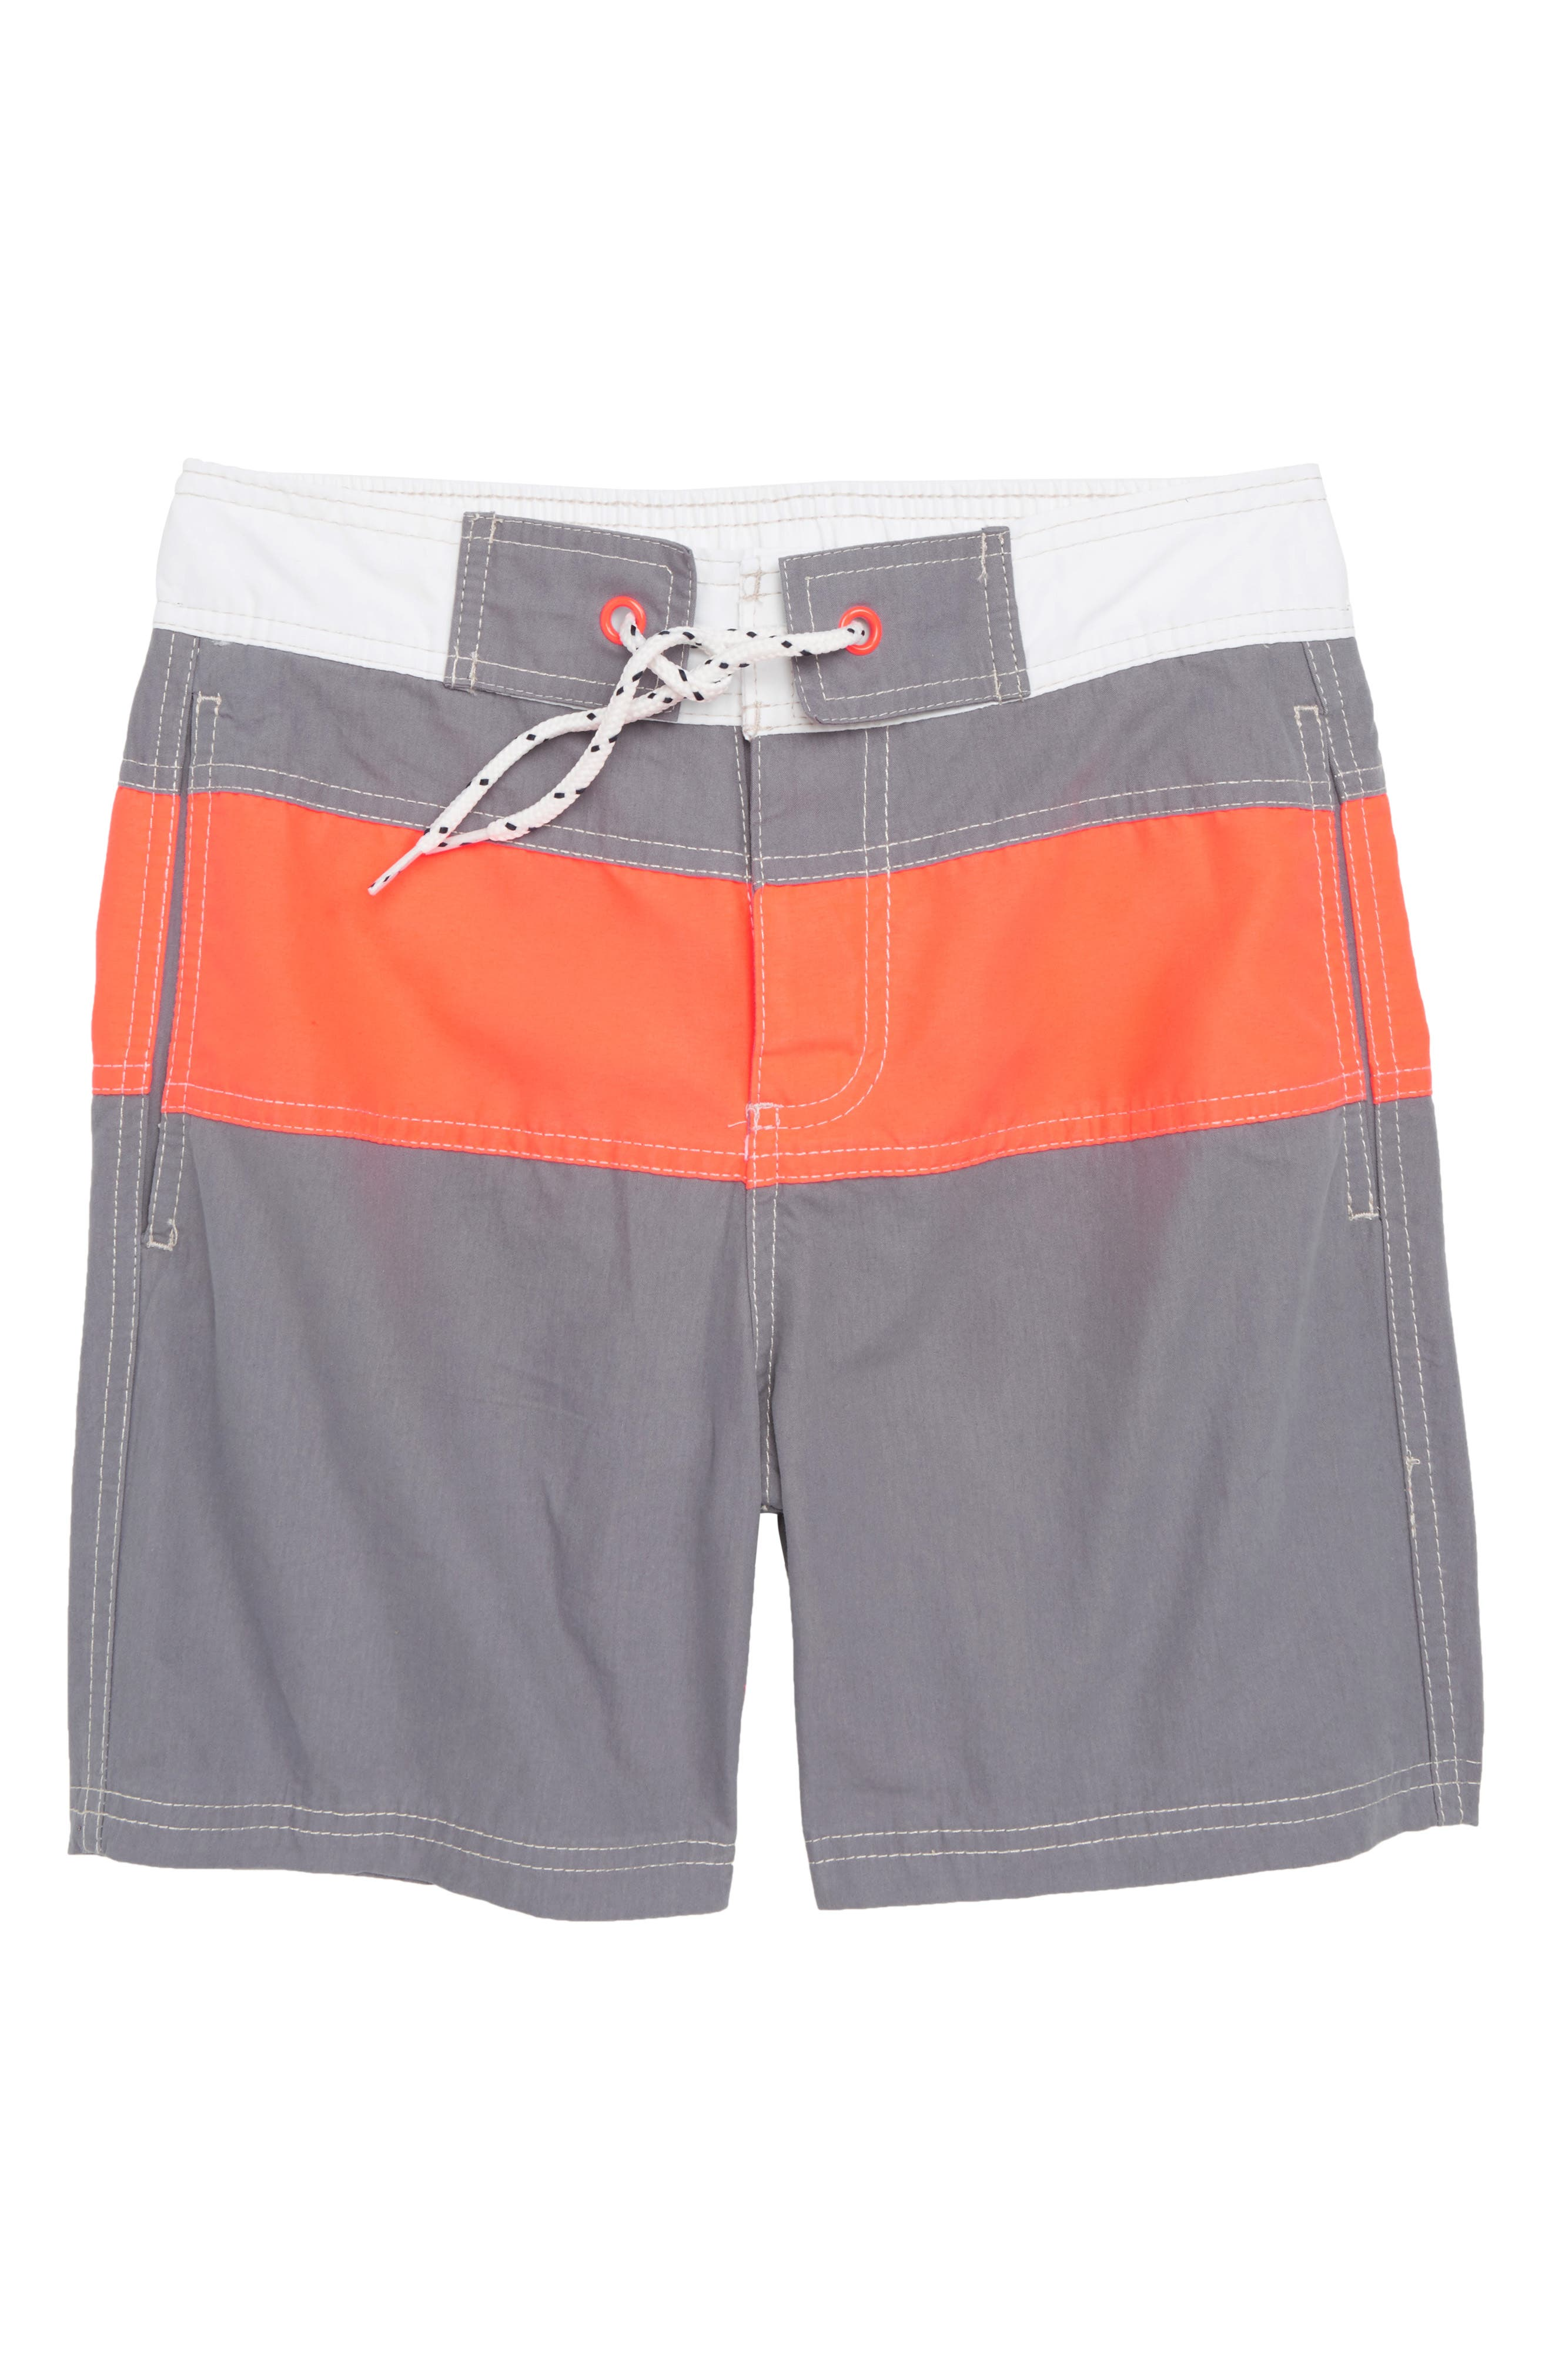 Poolside Swim Trunks,                         Main,                         color, 062